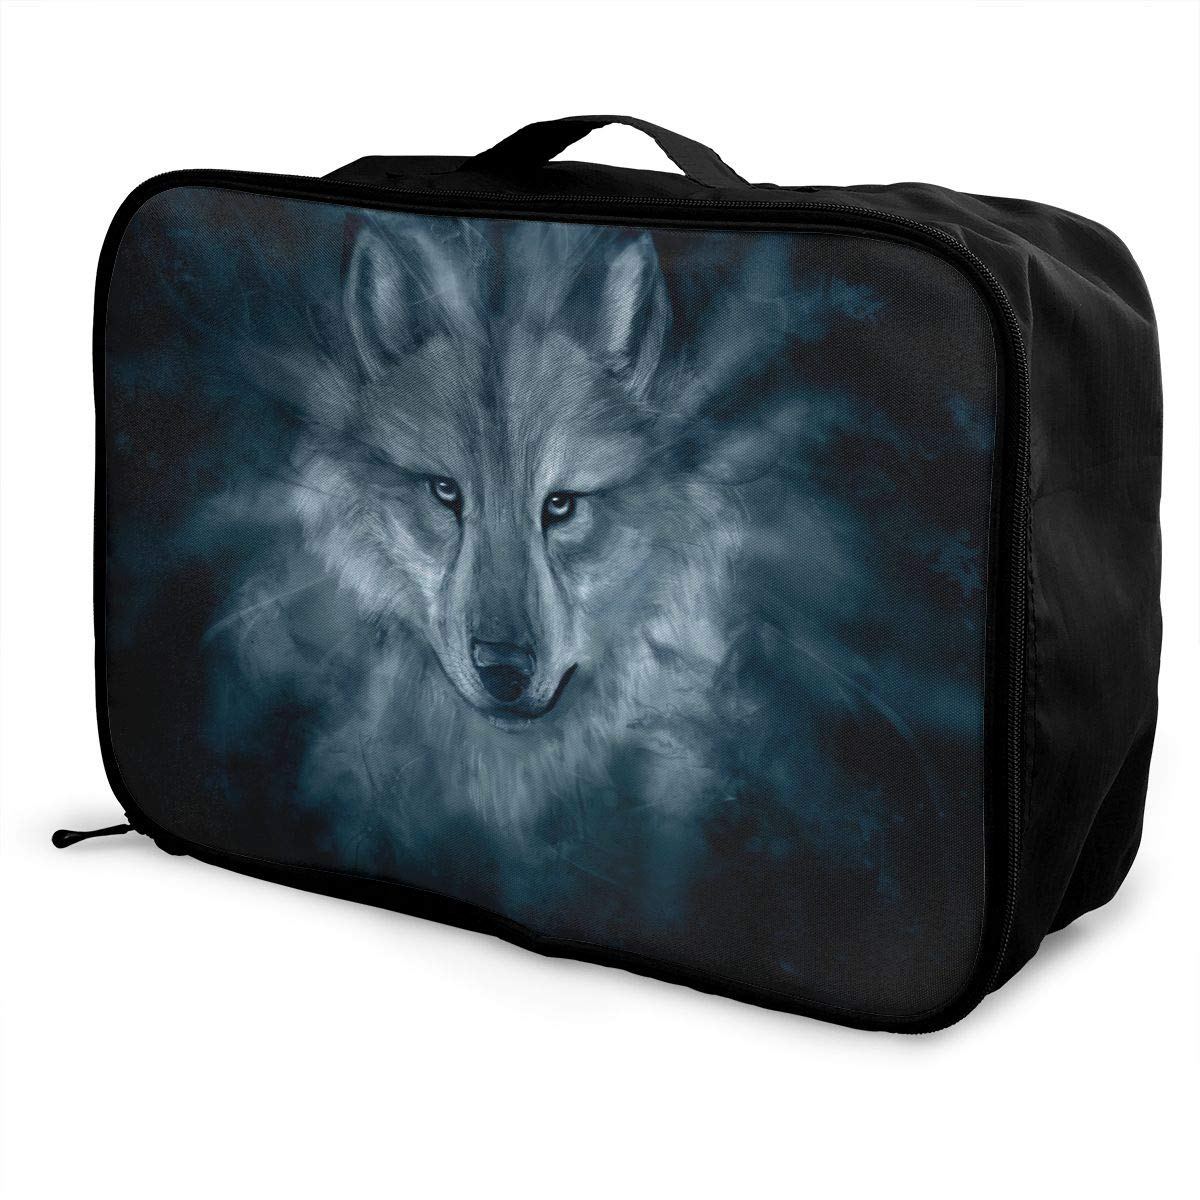 Travel Luggage Duffle Bag Lightweight Portable Handbag Wolf Print Large Capacity Waterproof Foldable Storage Tote